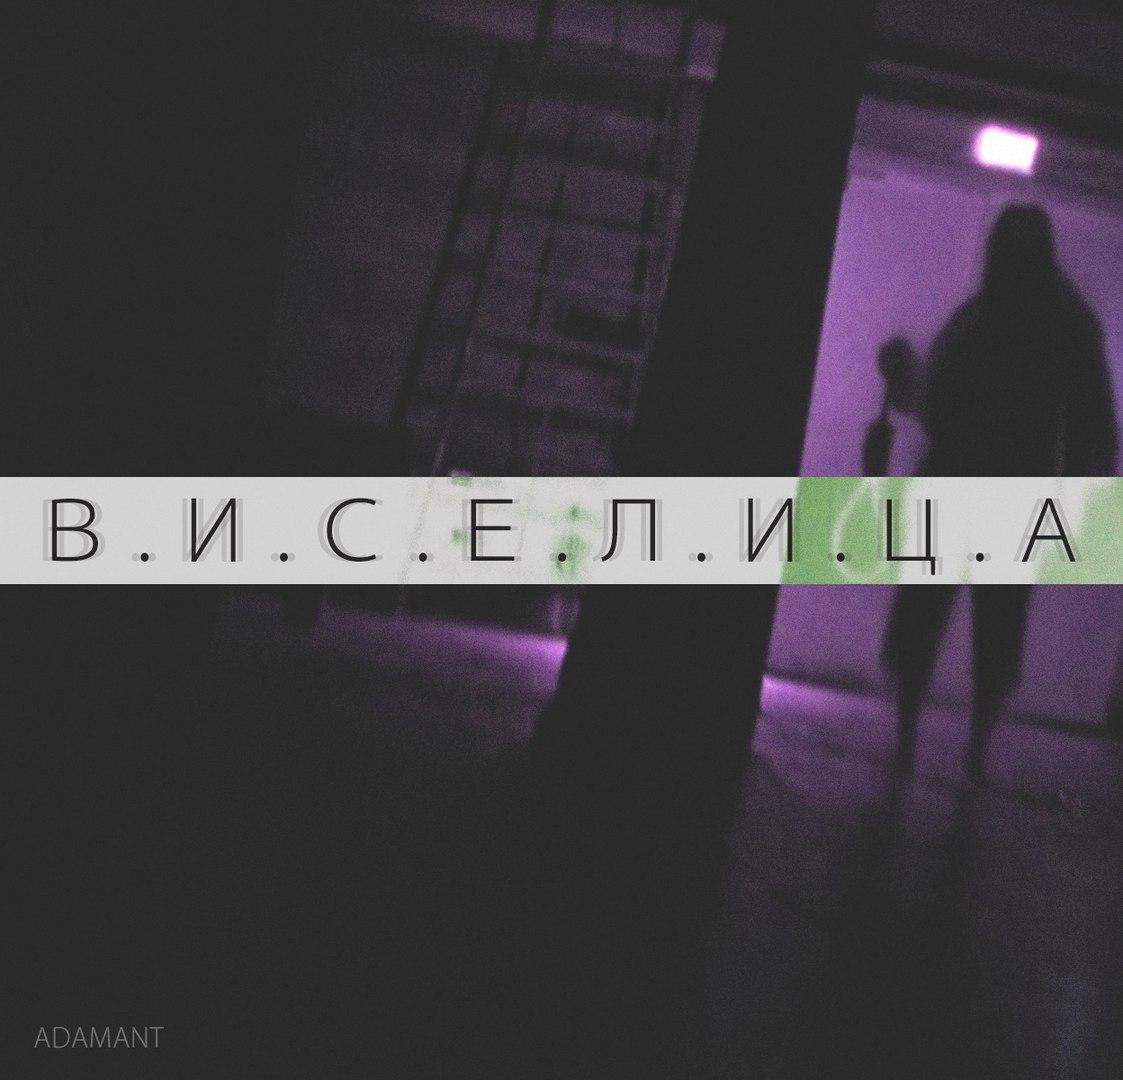 Adamant – Виселица (2017)